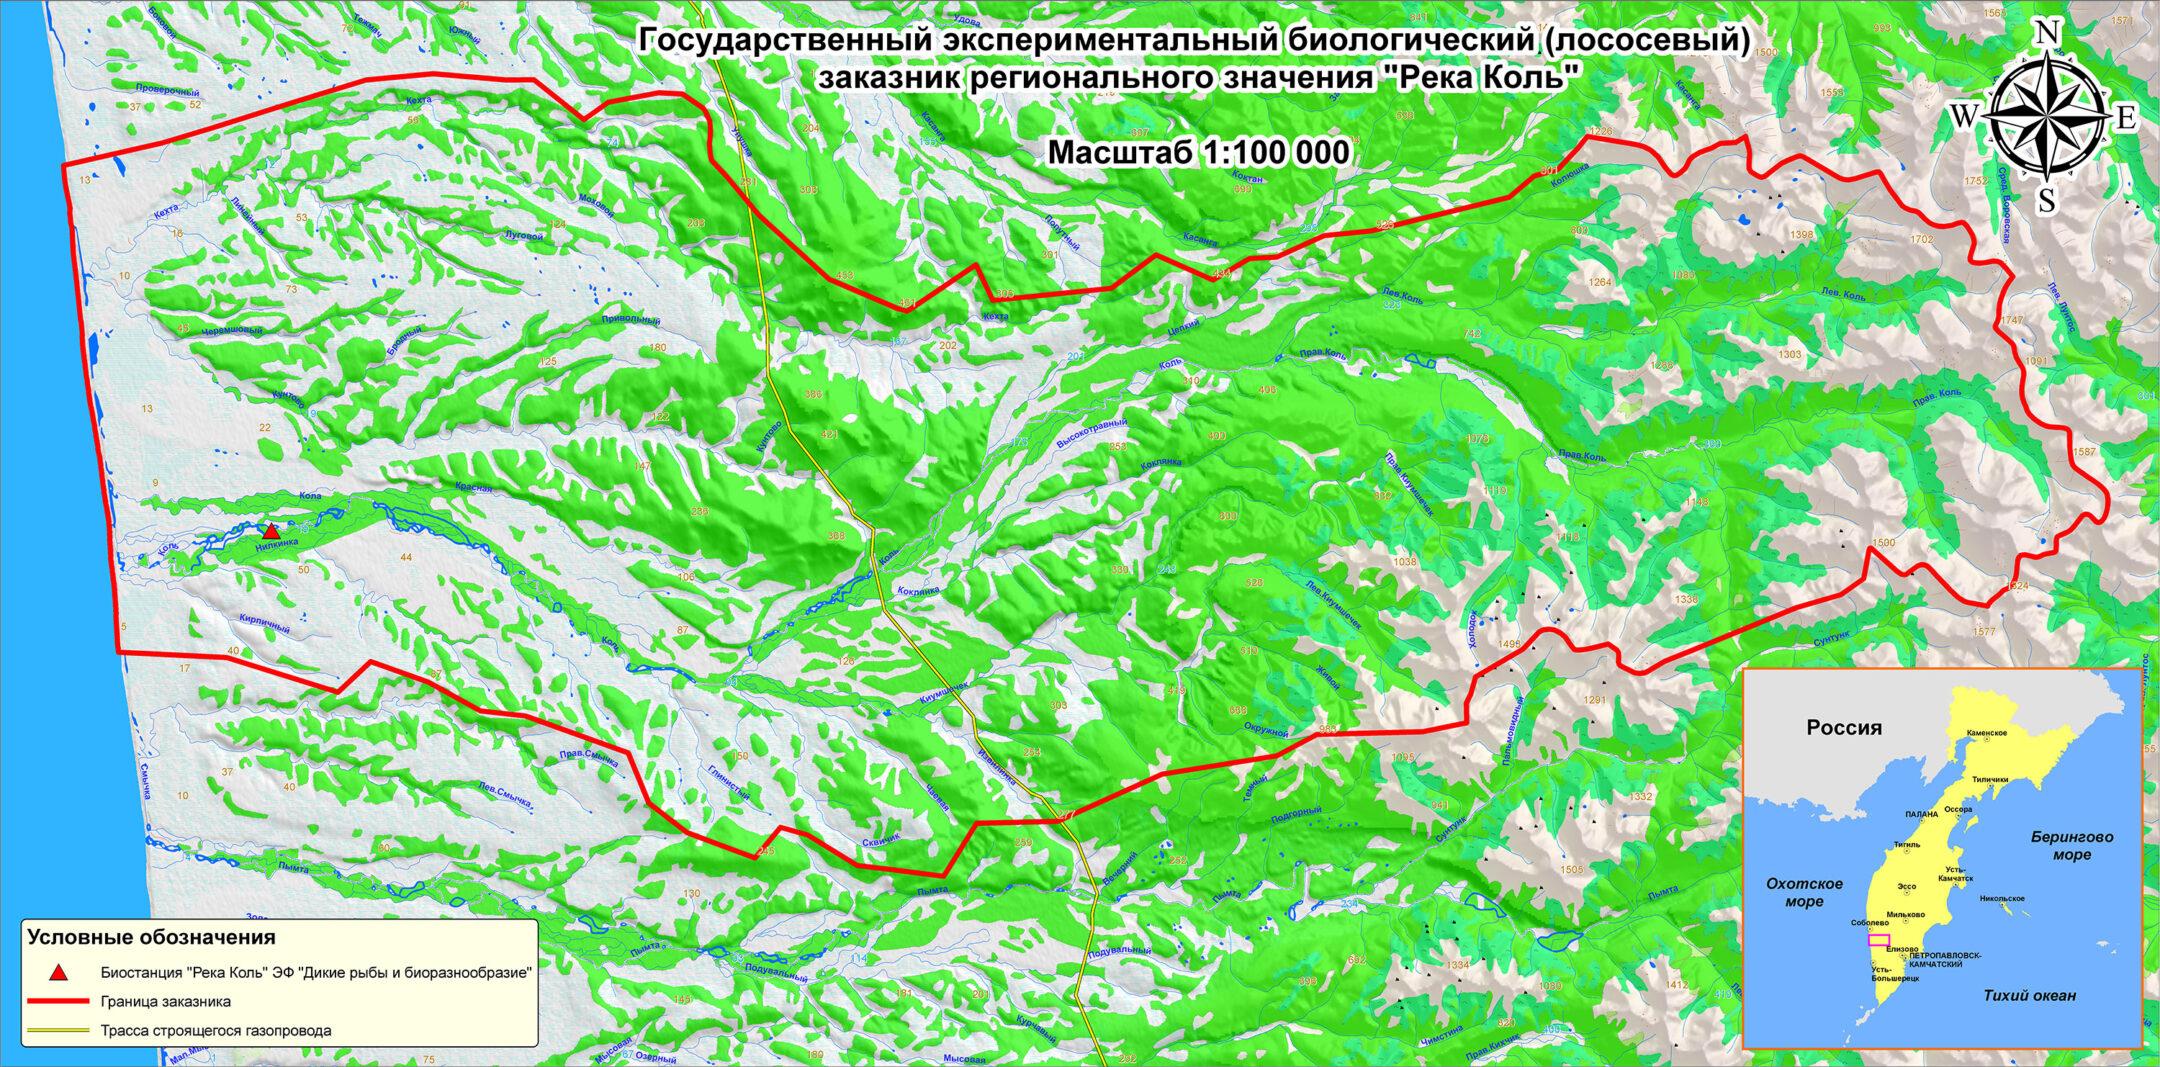 KolSalmonRefuge-topo-map-web-1